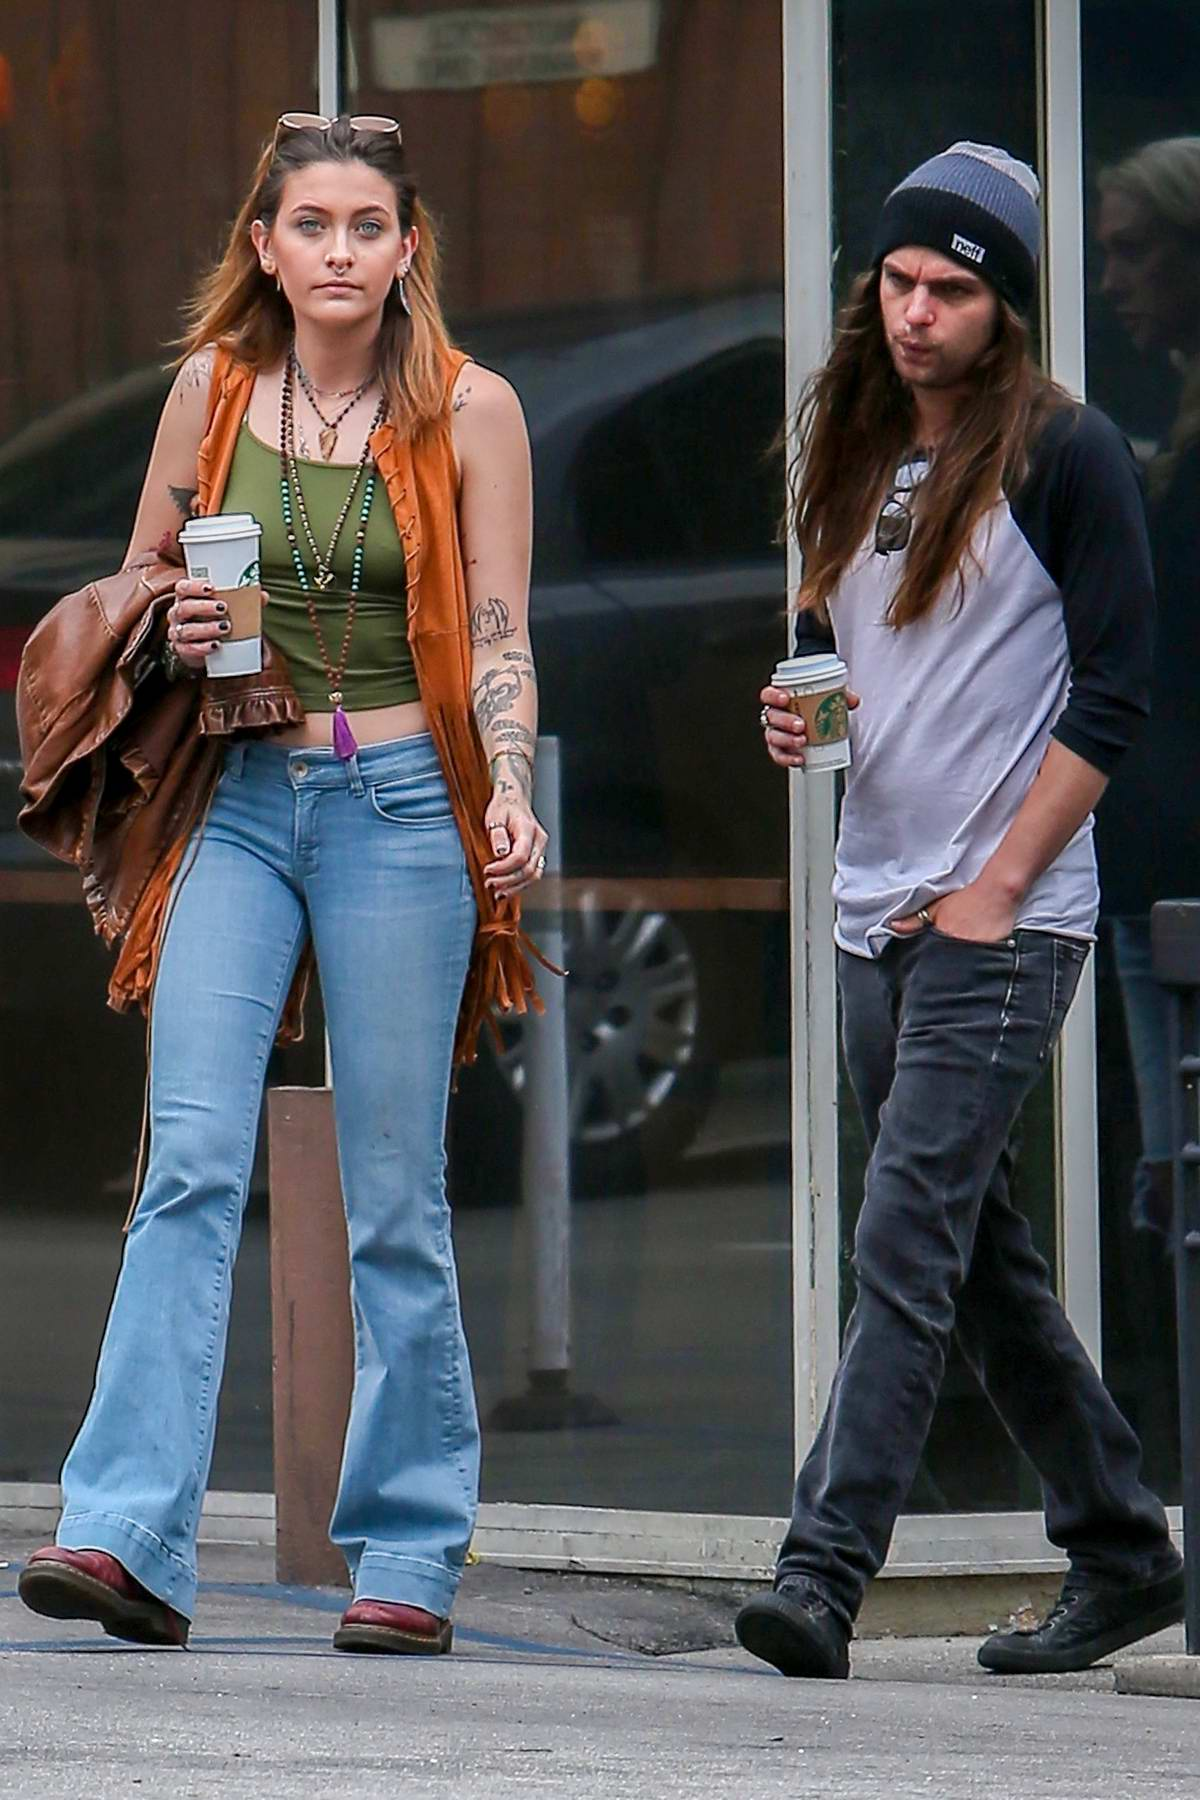 Paris Jackson Makes A Coffee Run With Her New Boyfriend